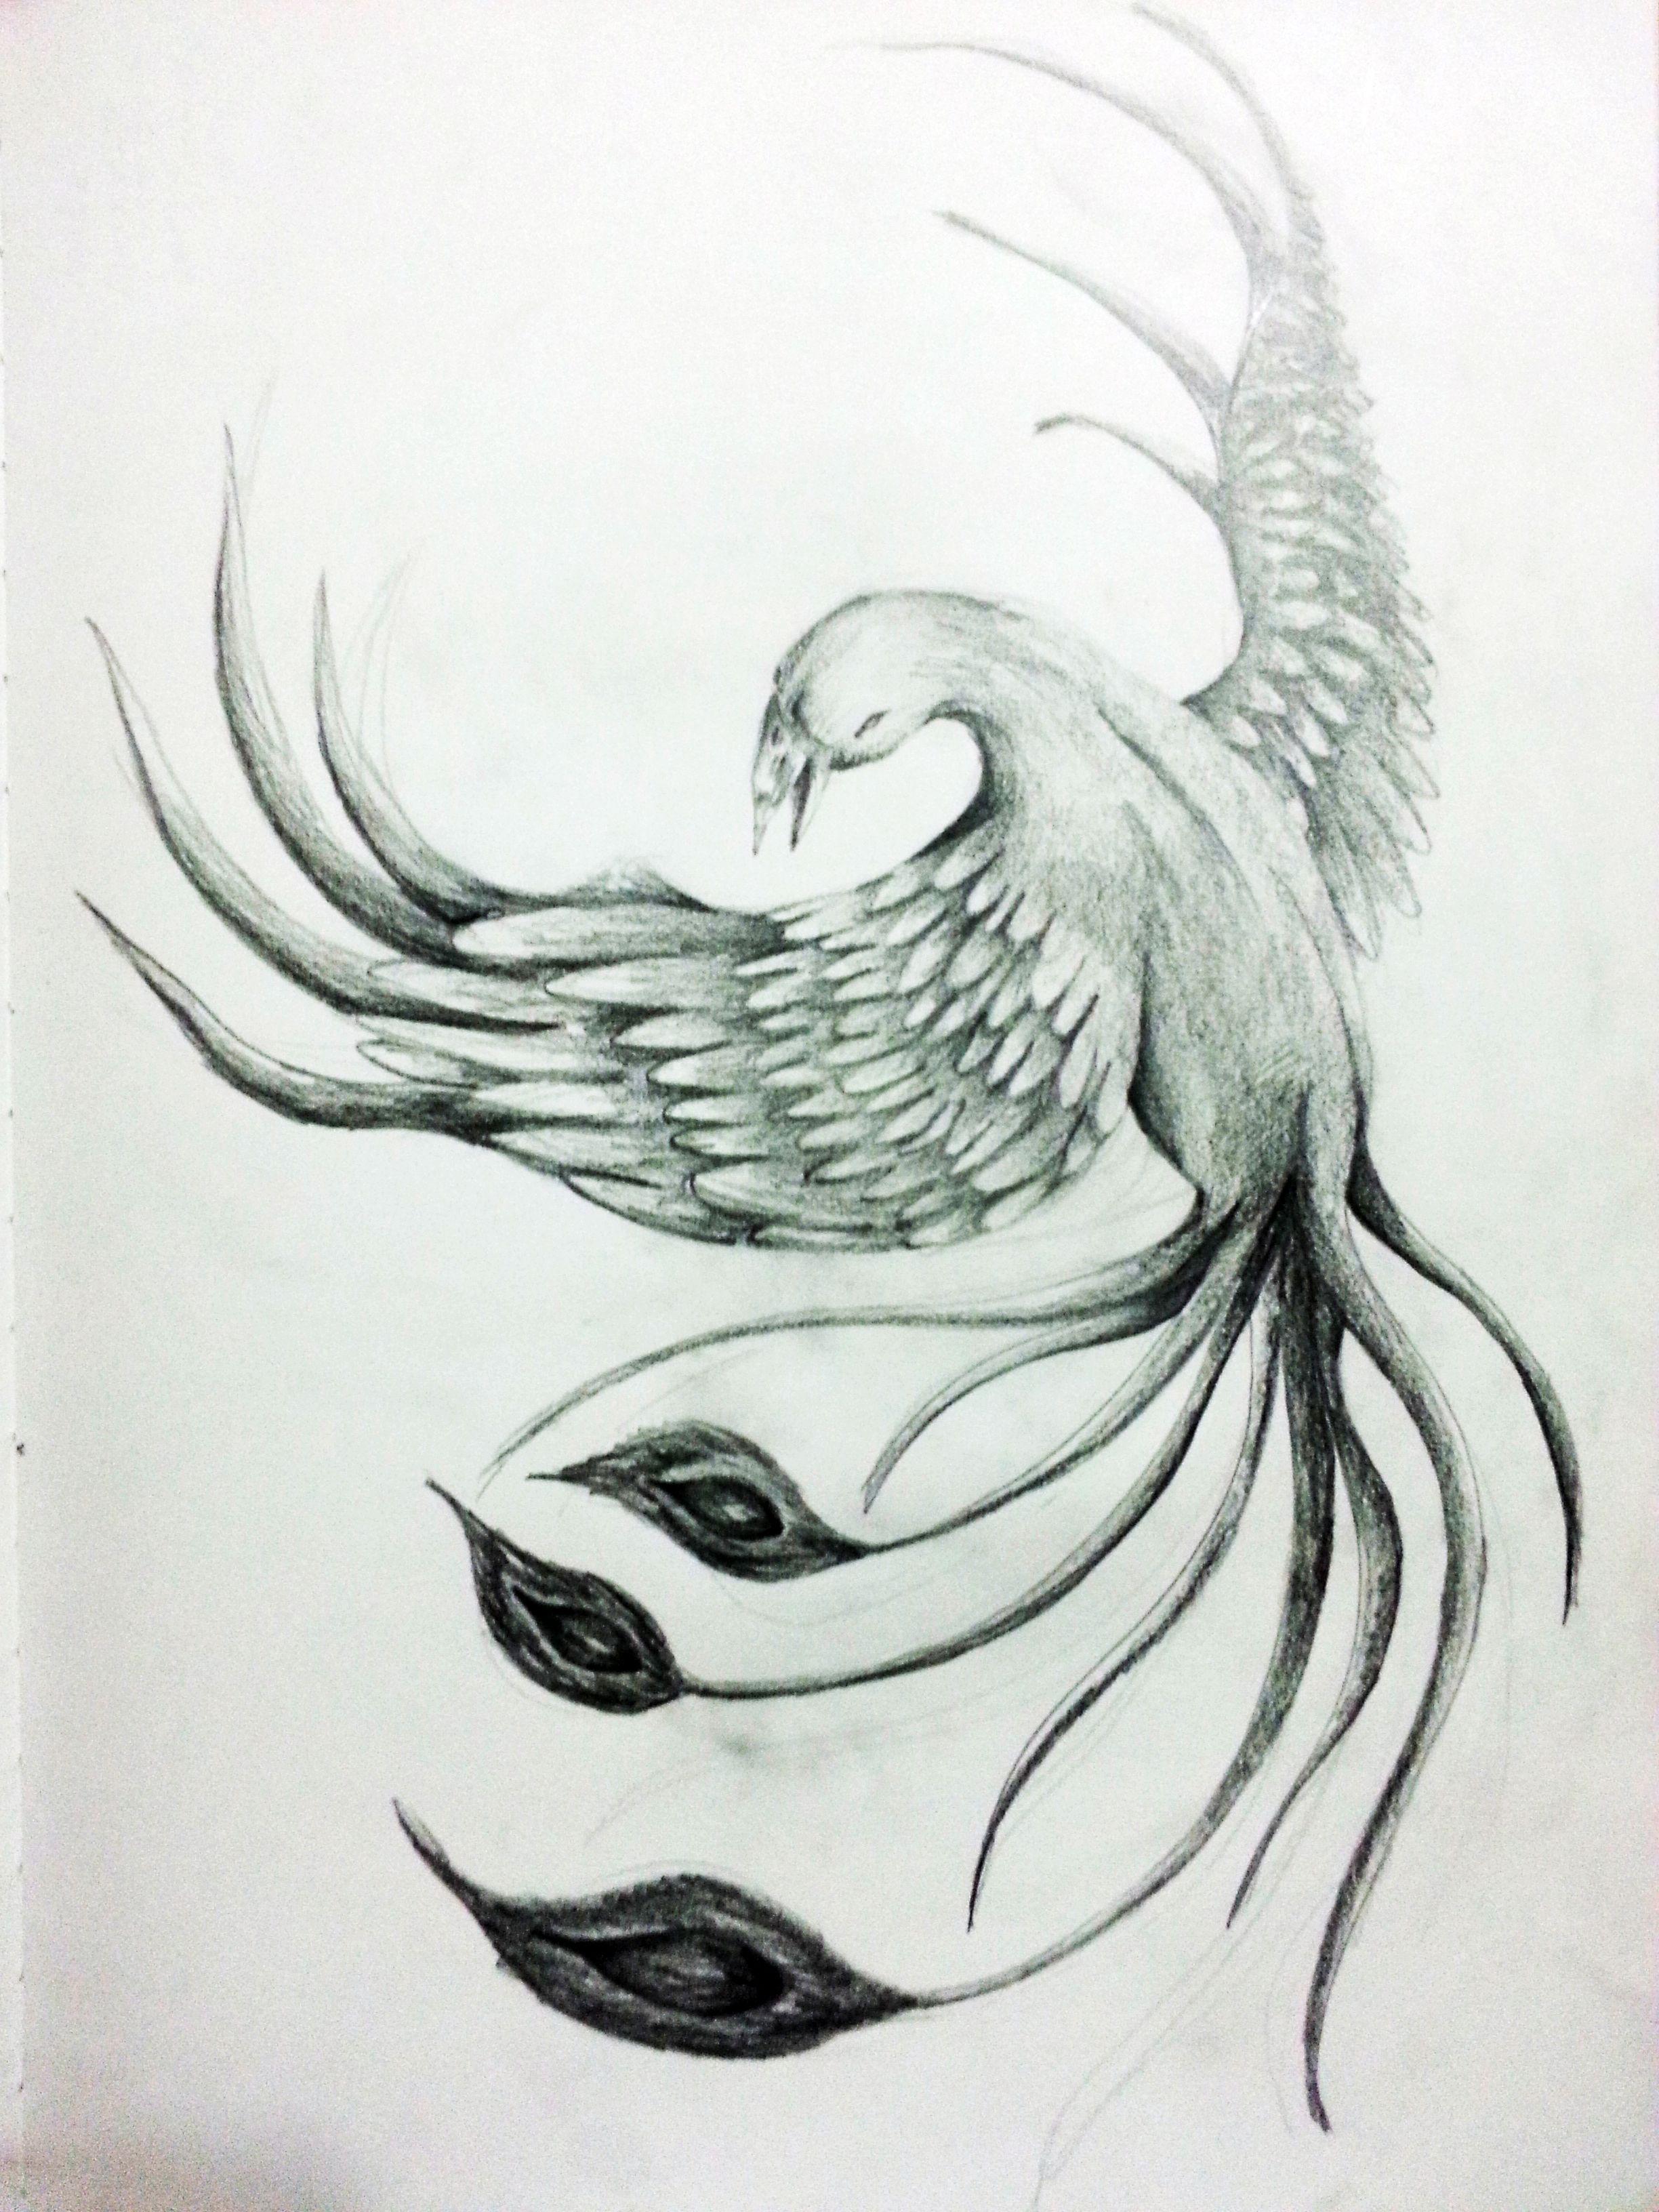 Beautiful things drawing in pencil